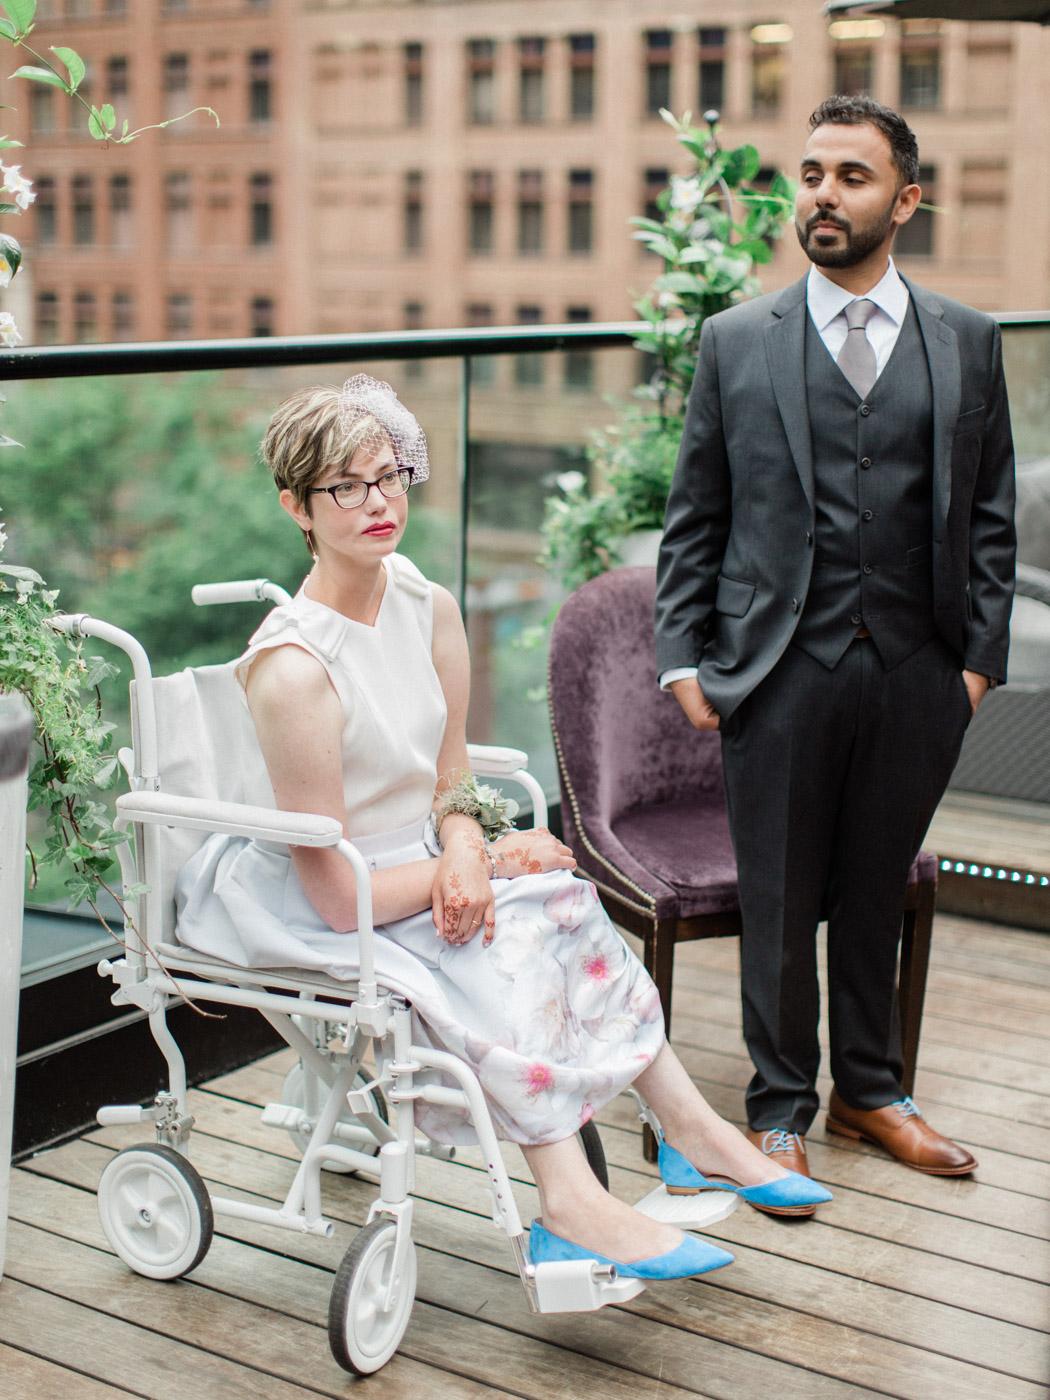 Toronto-wedding-photographer-intimate-restaurant-elopement-chase-oyster-downtown28.jpg